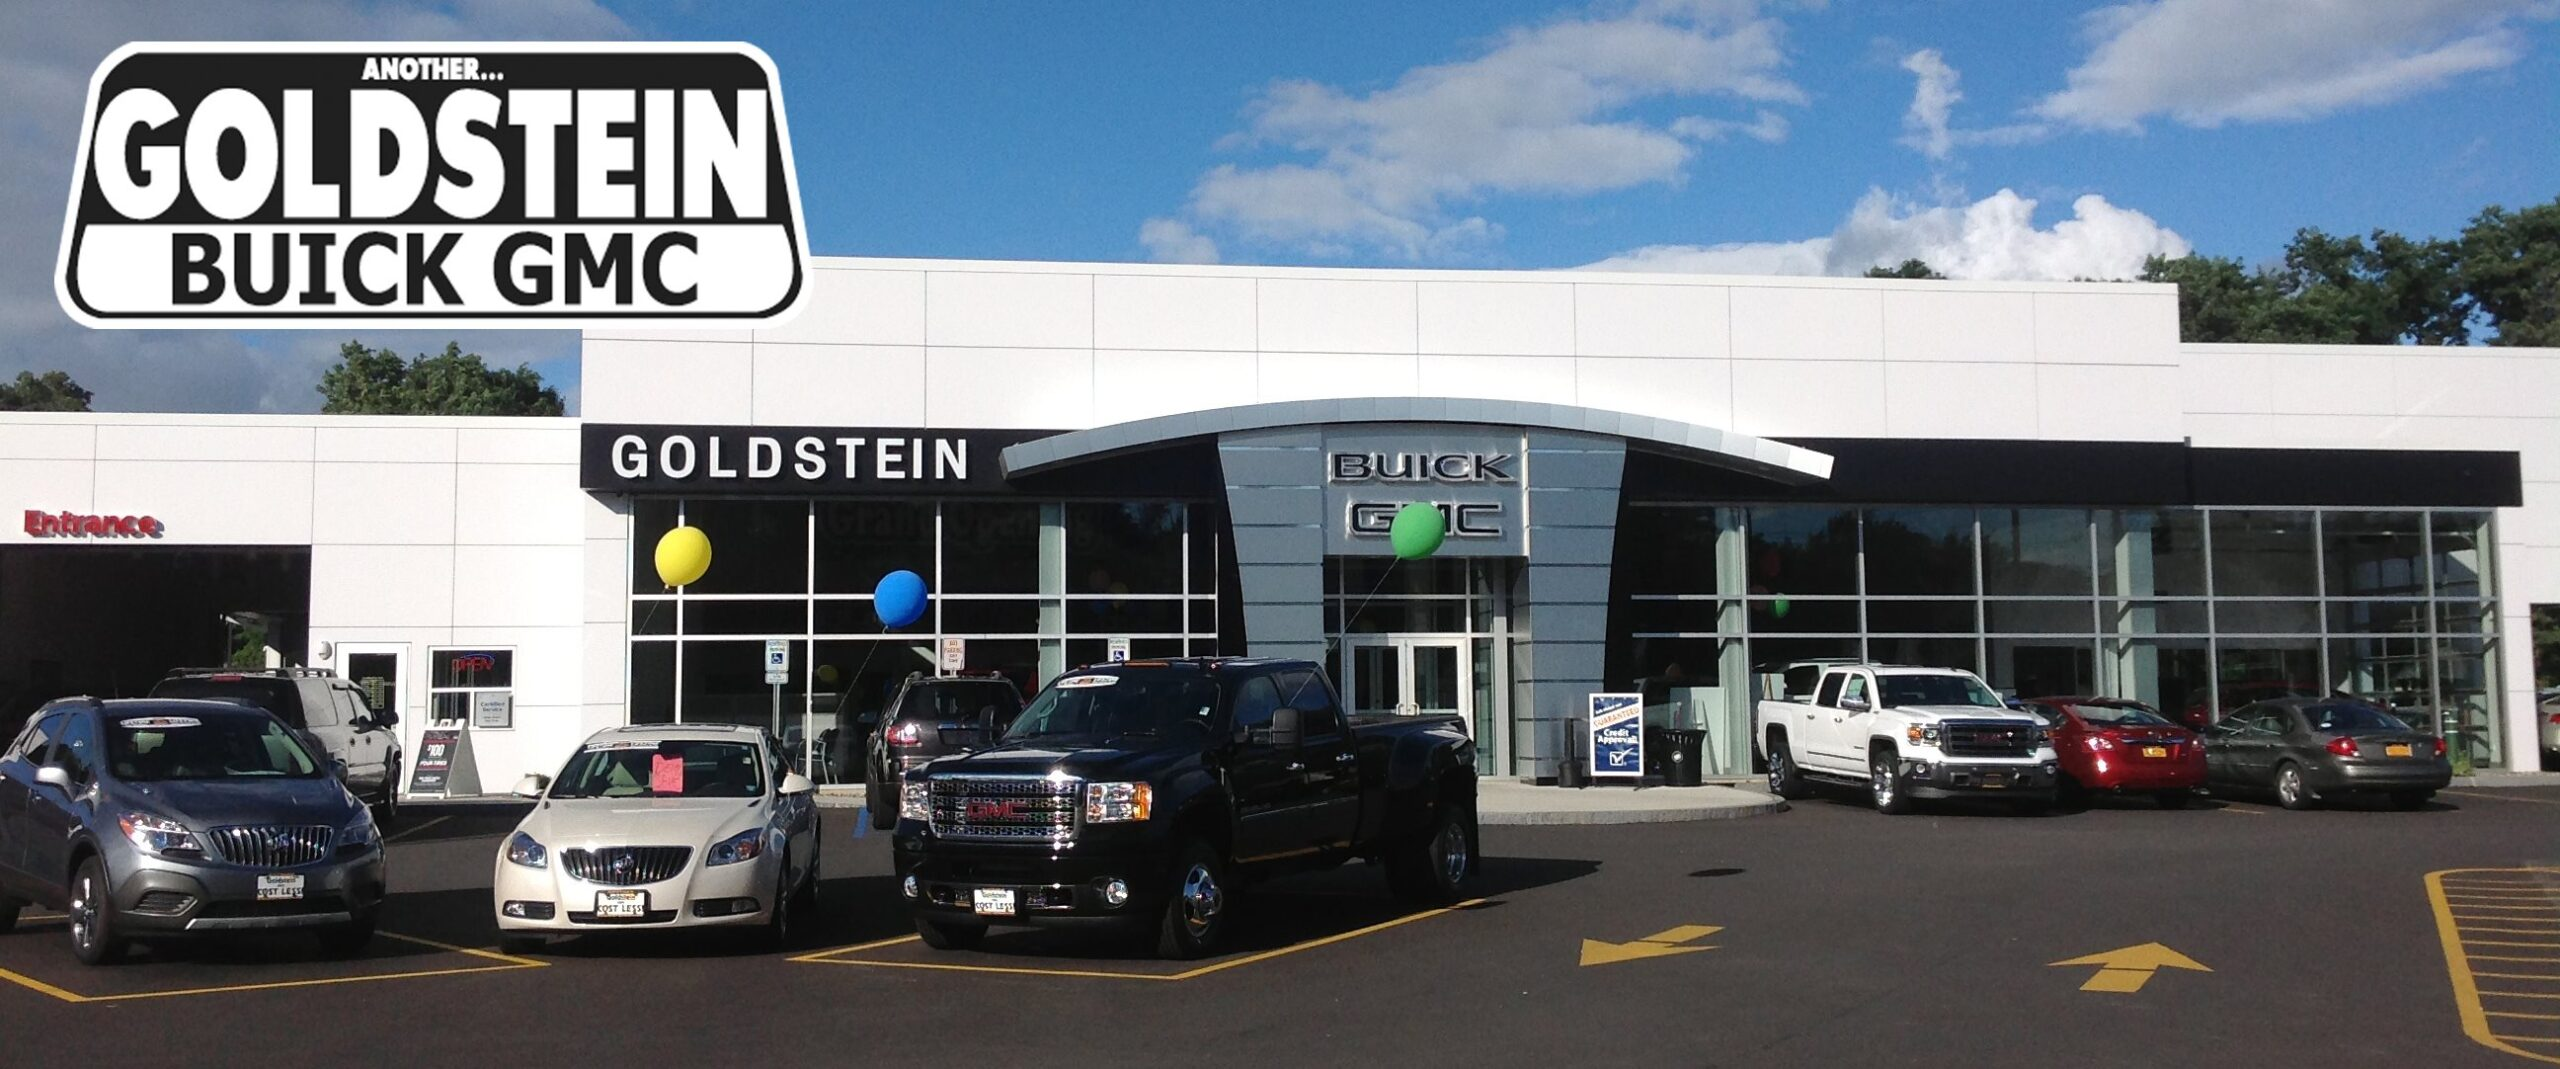 Goldstein GMC Dealer Albany, NY